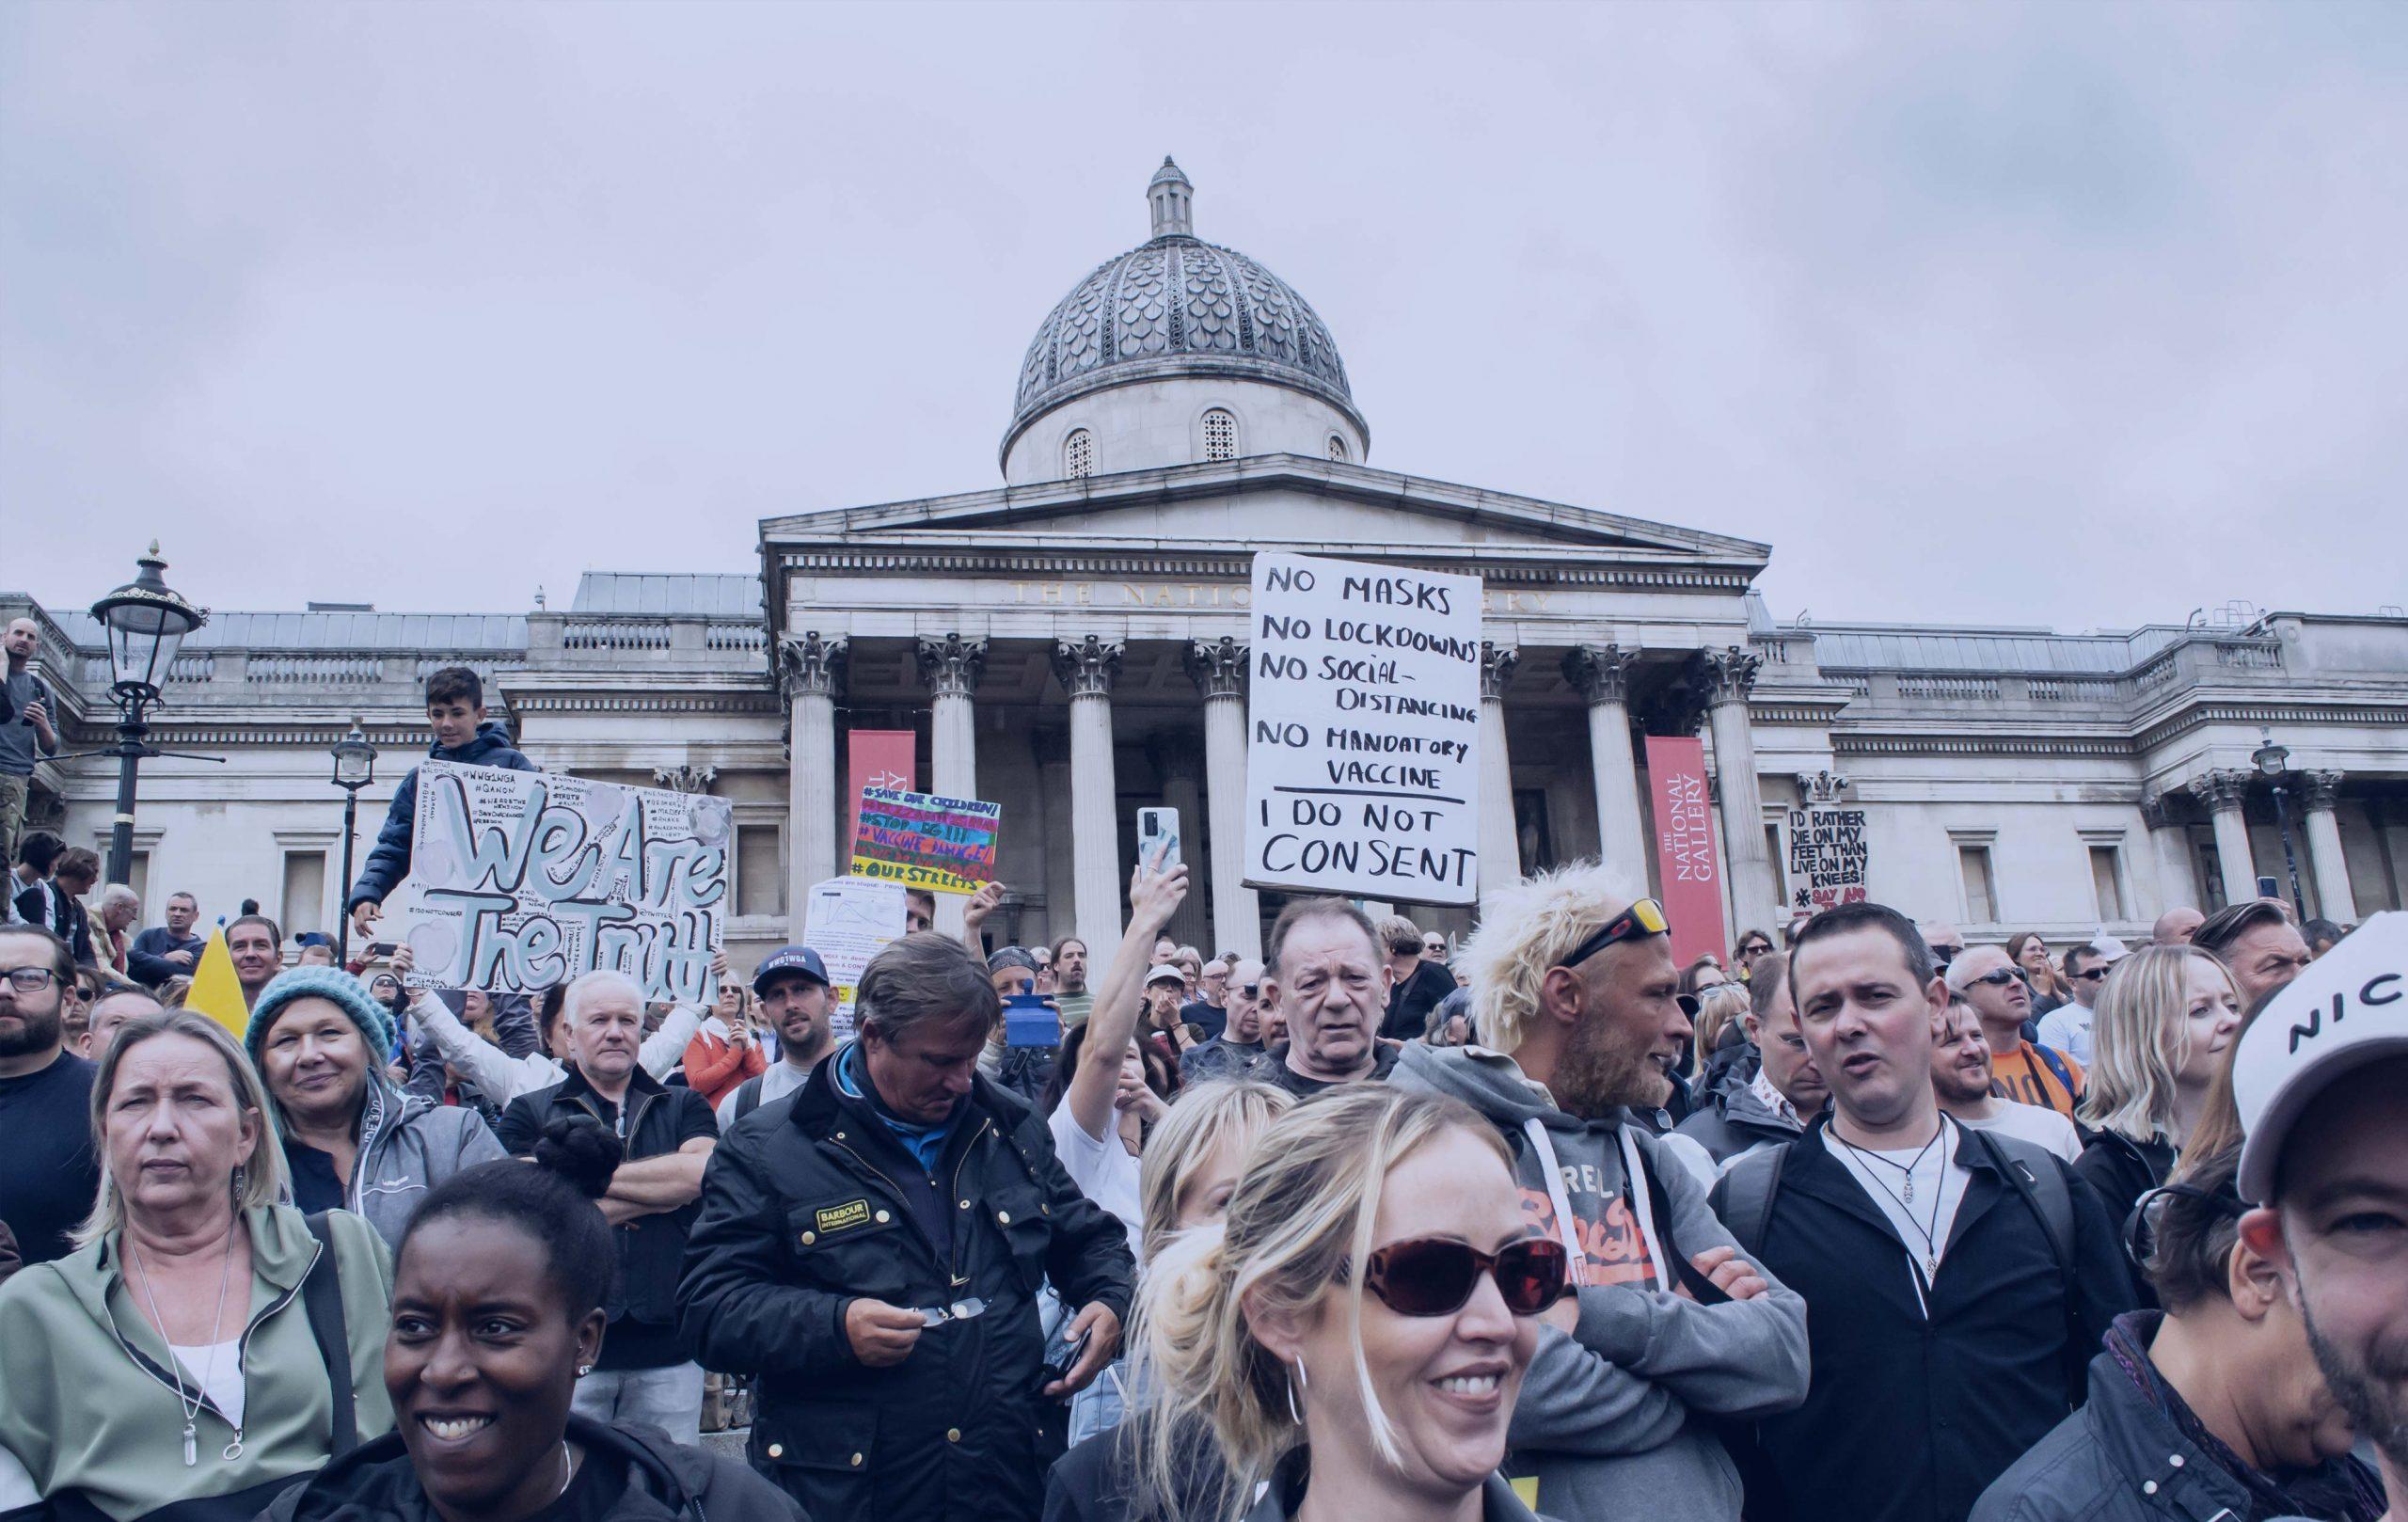 groupe de manifestants devant Trafalgar Square